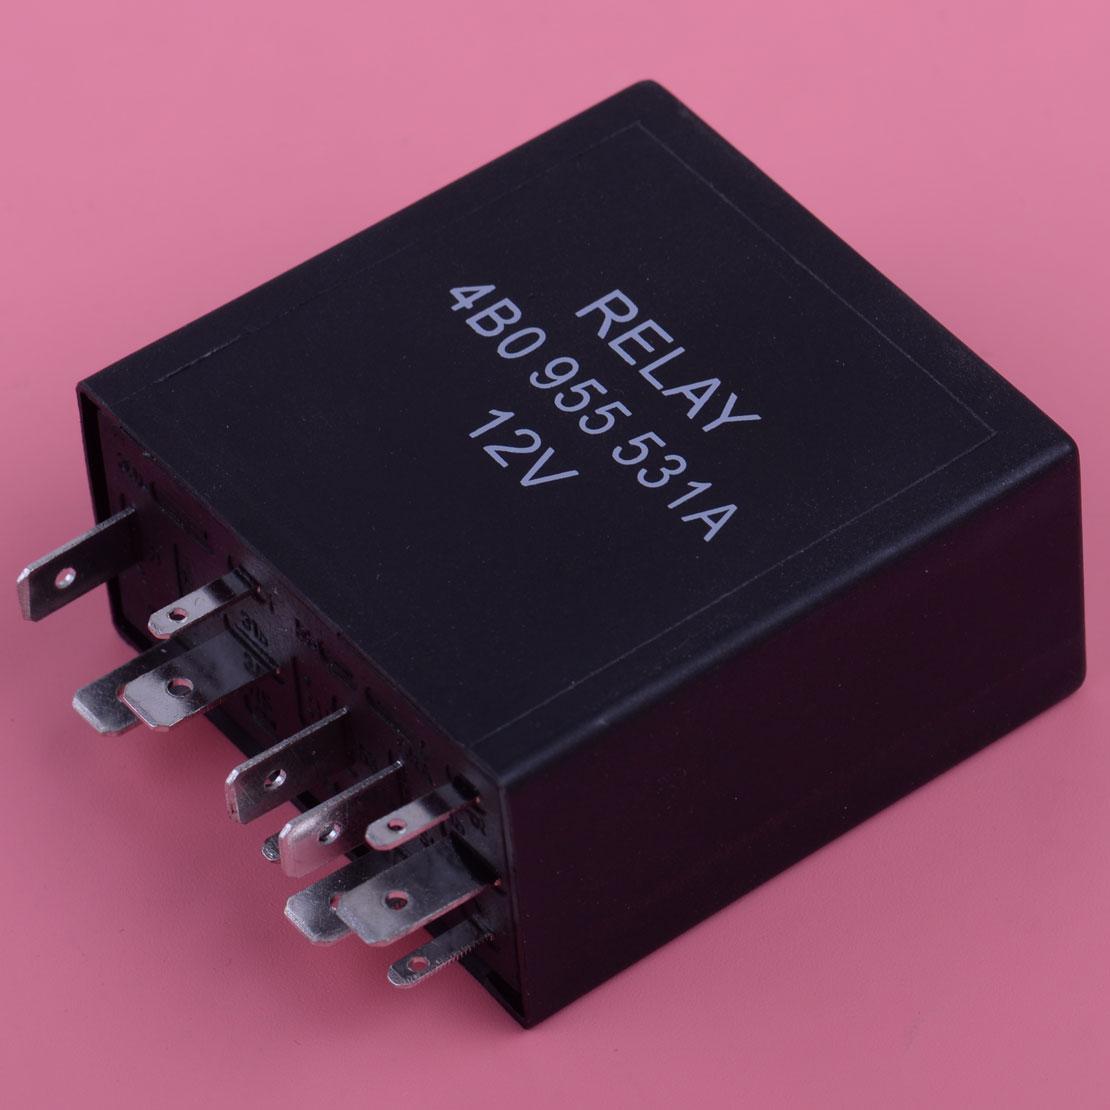 цены на CITALL 11 Pin 377 Intermittent Delay Wiper Motor Control Relay 4B0955531A For VW Golf GTI Passat Jetta Audi A4 A6 A8 4B0955 531A  в интернет-магазинах